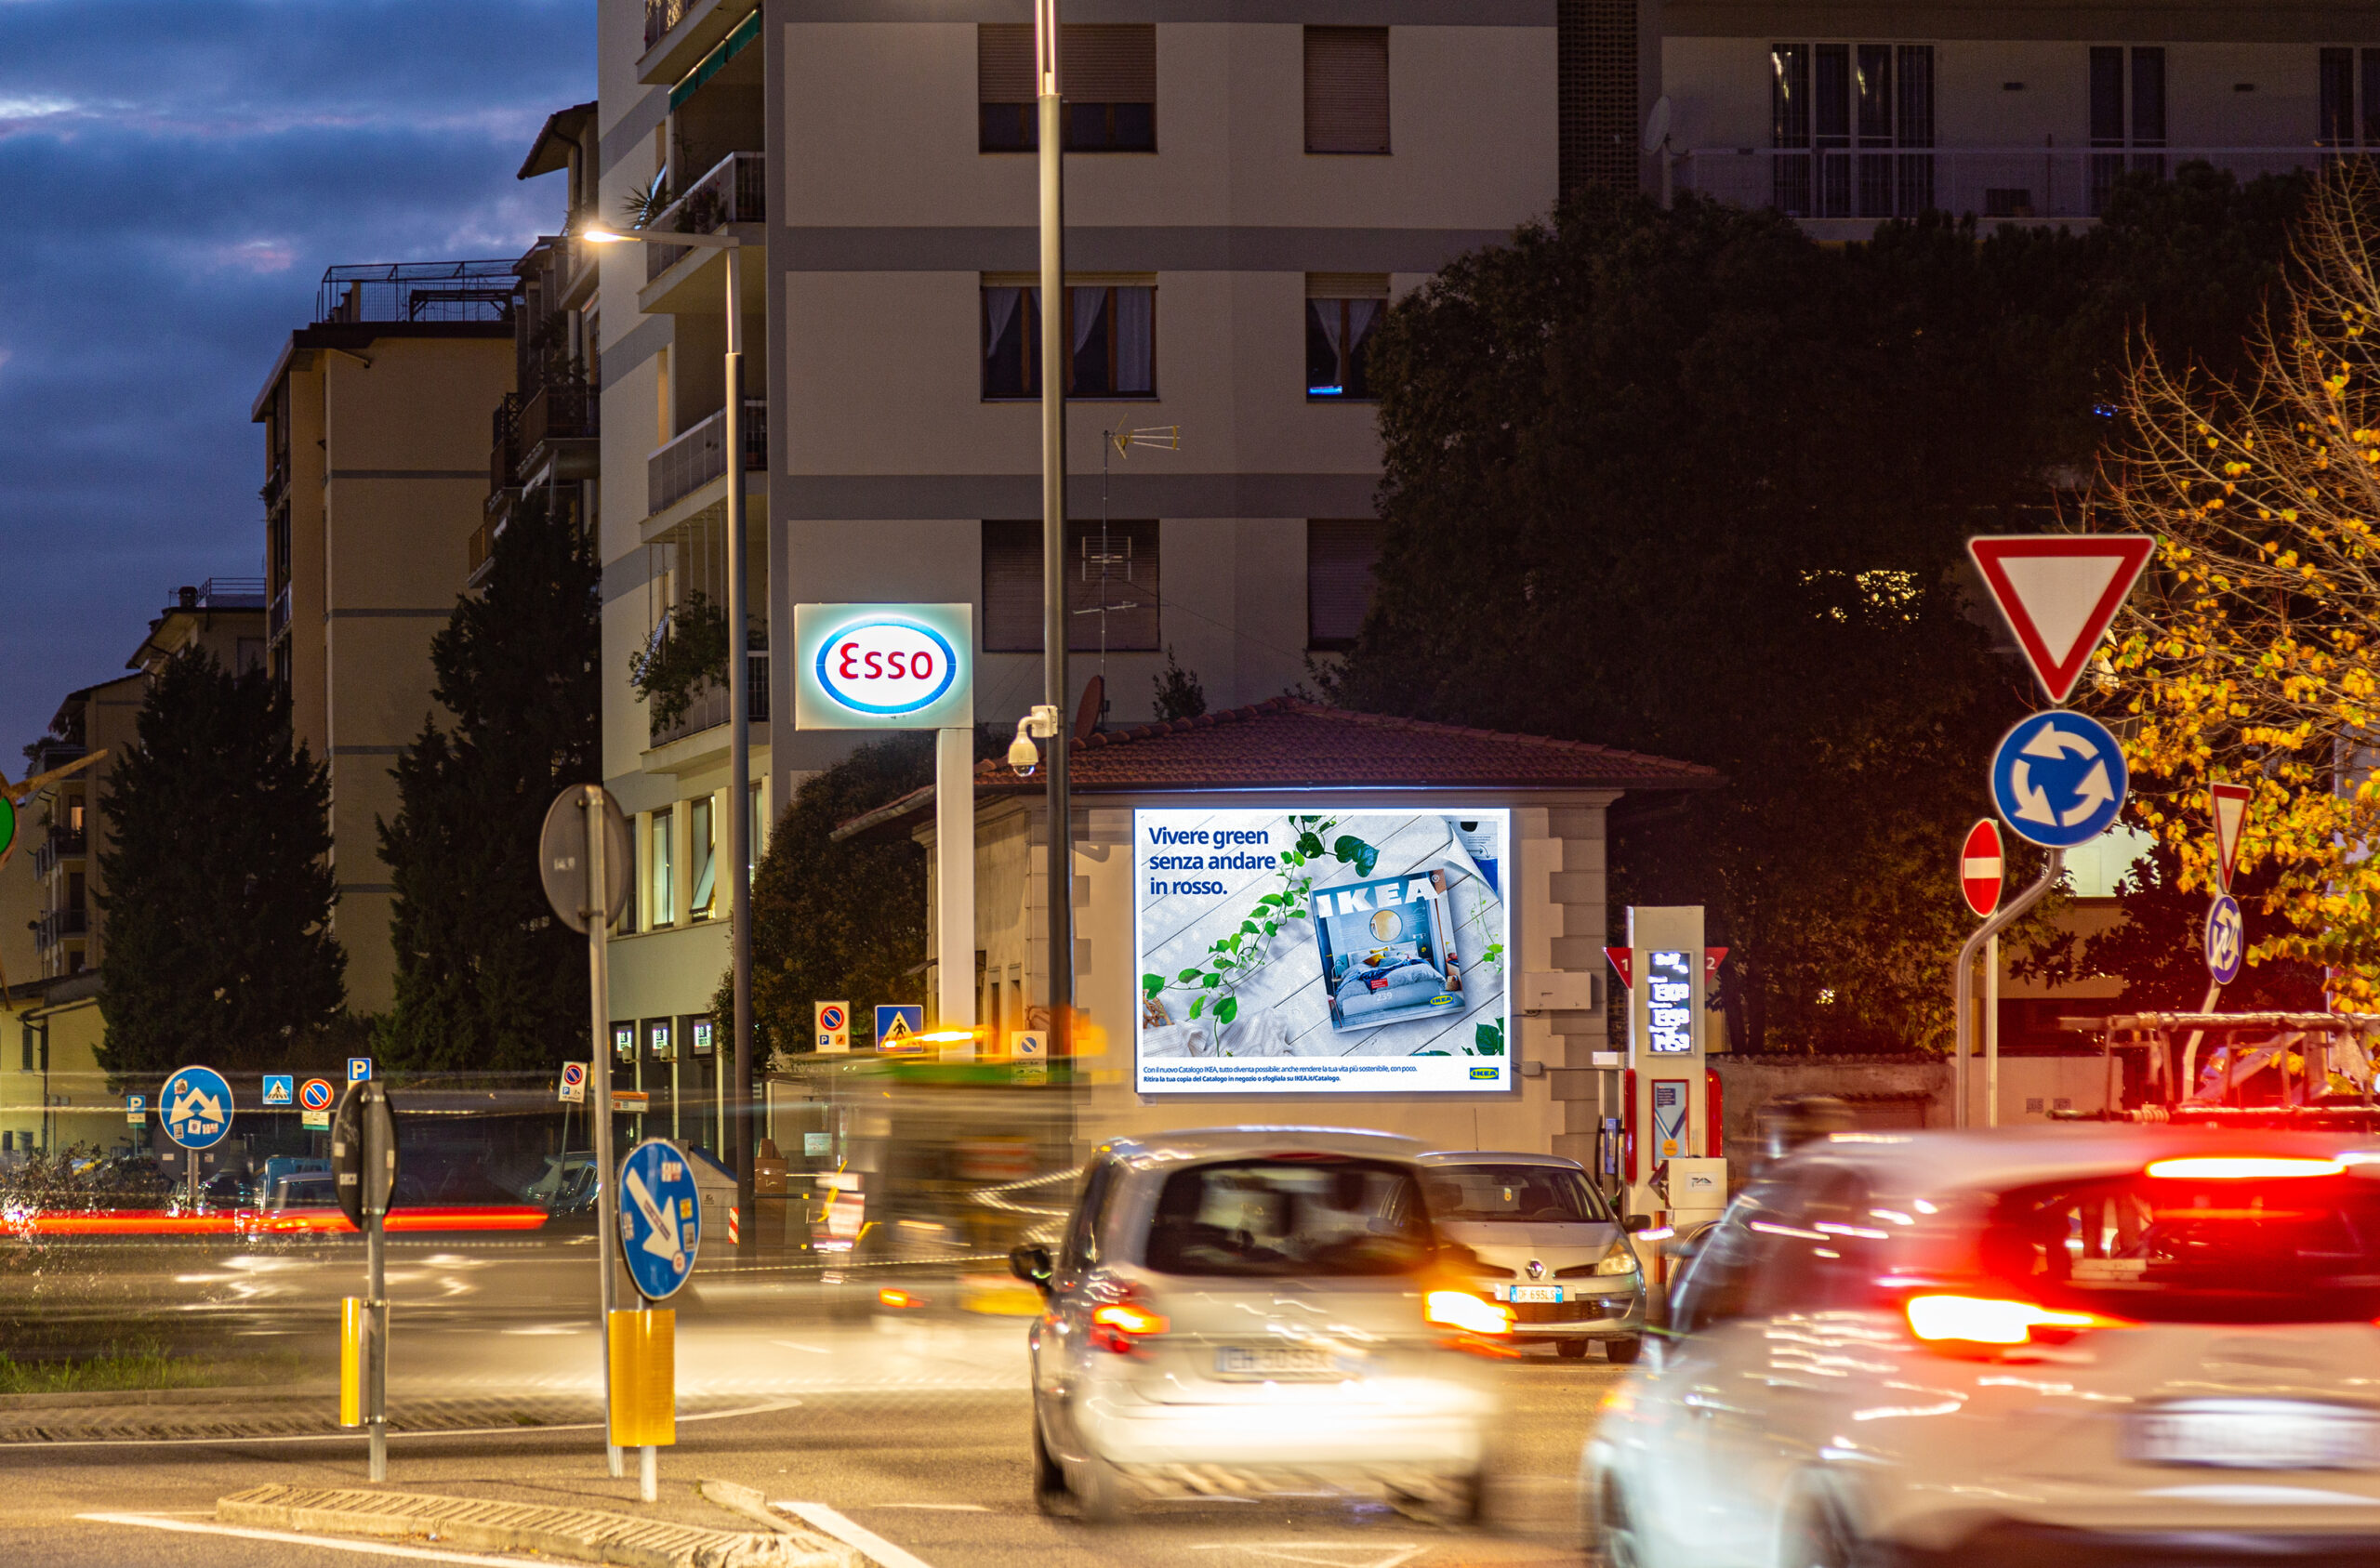 FI – Via Aretina – poster ledwall 4×3 (notturna)